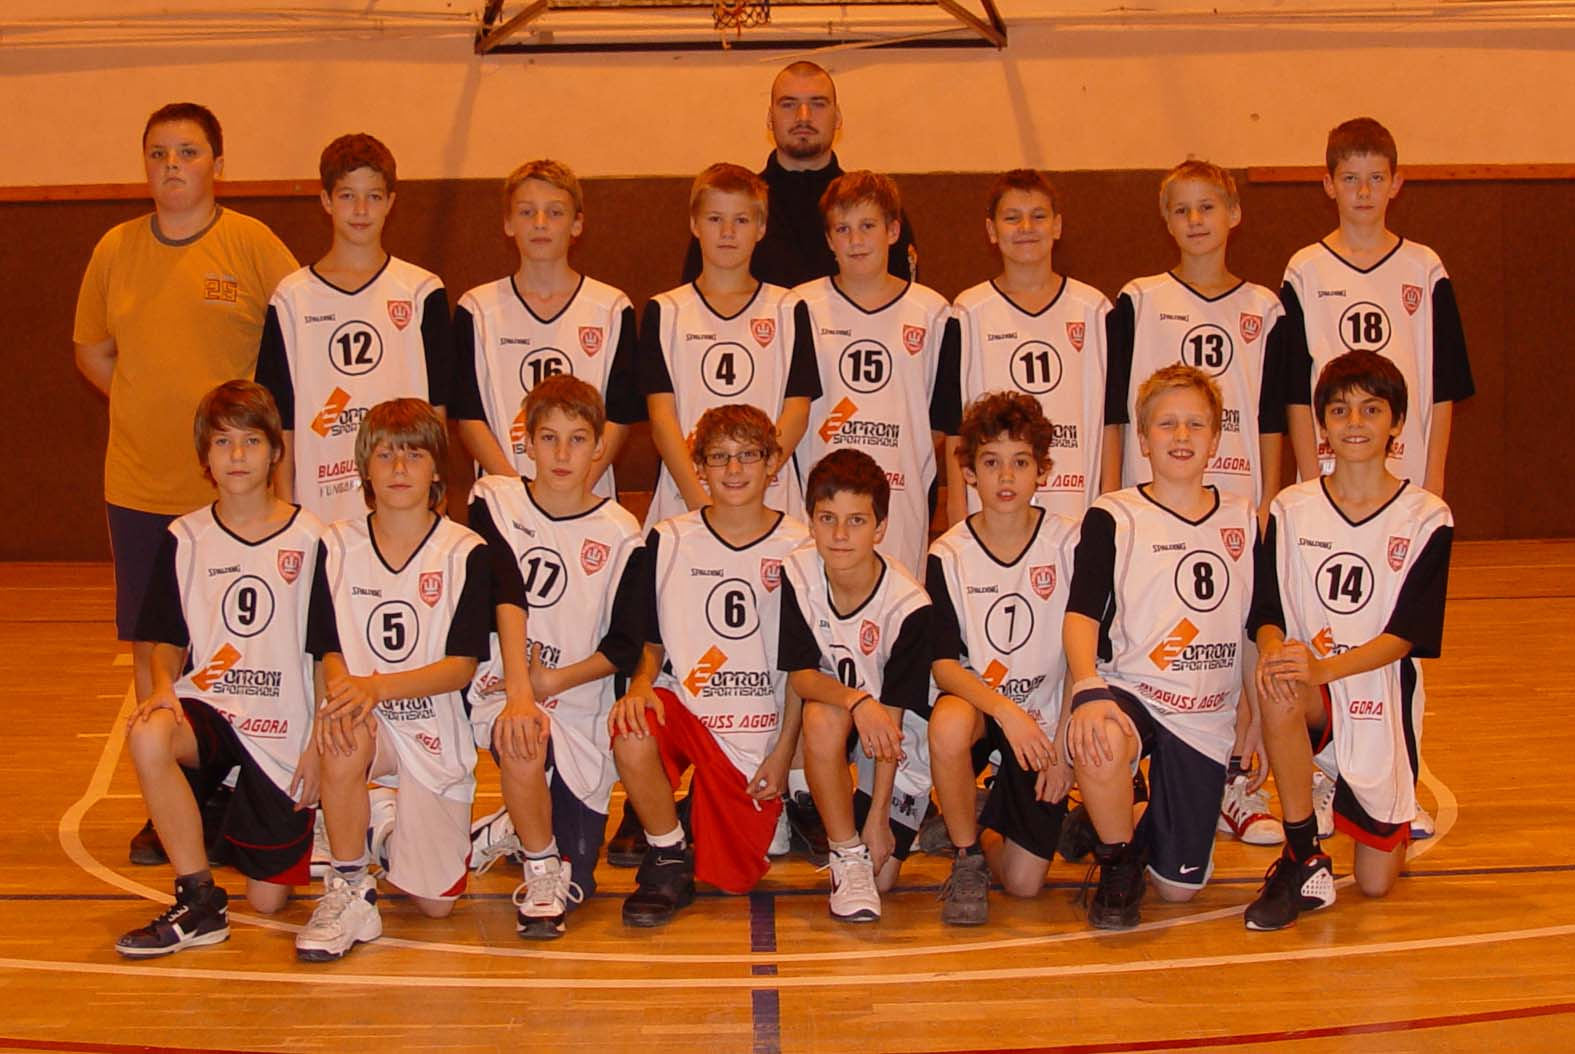 06 - 99 csapatkep